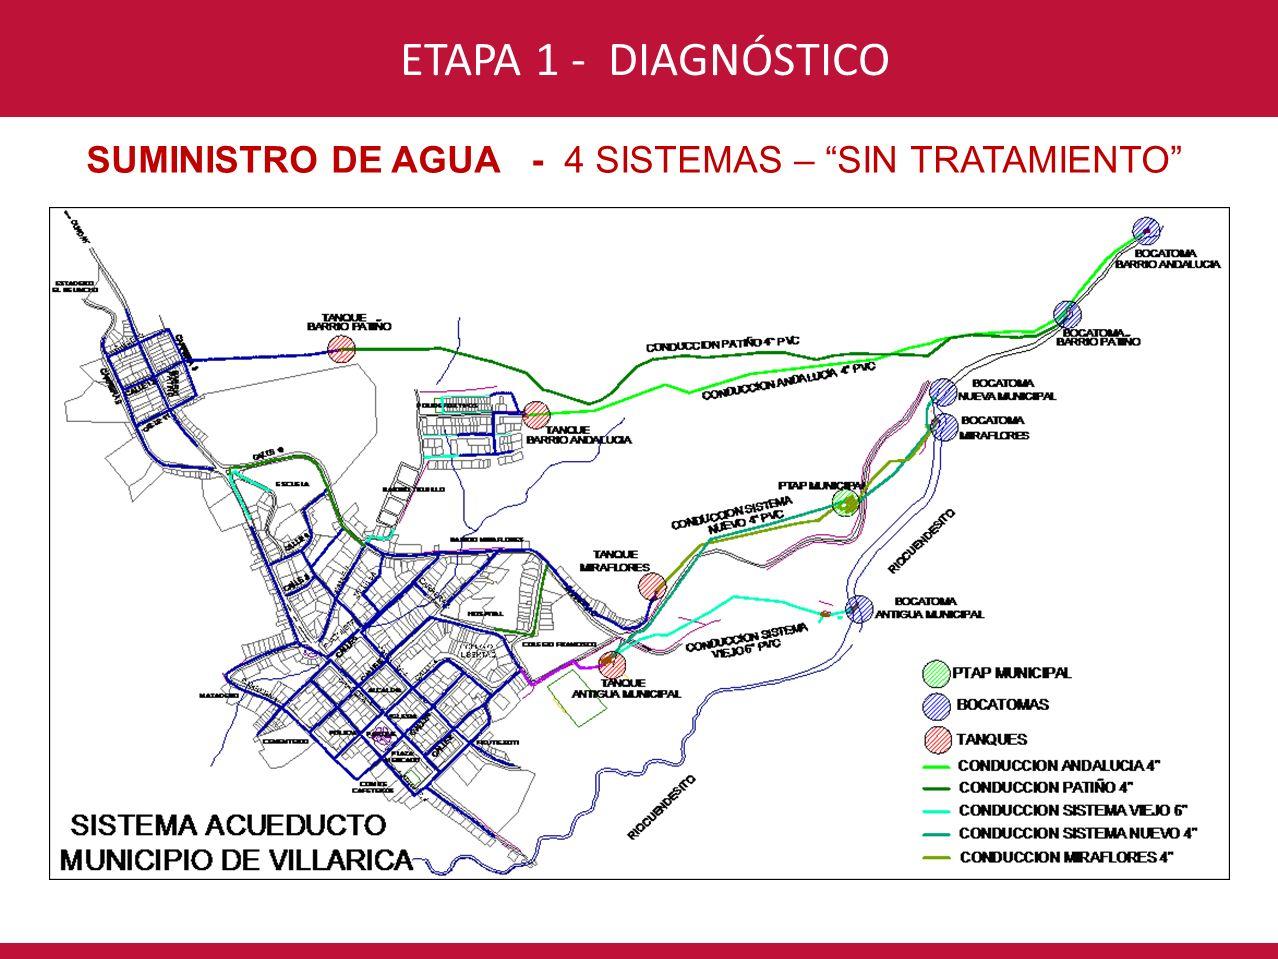 CONSORCIO INTERVENTORÍA POR UN NUEVO VALLE ETAPA 1 - DIAGNÓSTICO DISTRIBUCIÓN DE AGUA - TUBERÍA LONGITUD% Municipio430744% Miraflores317632% Andalucia8008% Higinio Patiño150815% 9791100% DIÁMETROLONGITUD% 3/4 644,27% 1 1759,3418% 1 1/2 524,985% 2 1653,9917% 3 4191,0243% 4 745,468% 6 271,983% TOTAL9790,97100% MATERIAL - PVC DIÁMETRO 30% Tubería < 2 RAS REGLAMENTO DE AGUA Y SANEAMIENTO